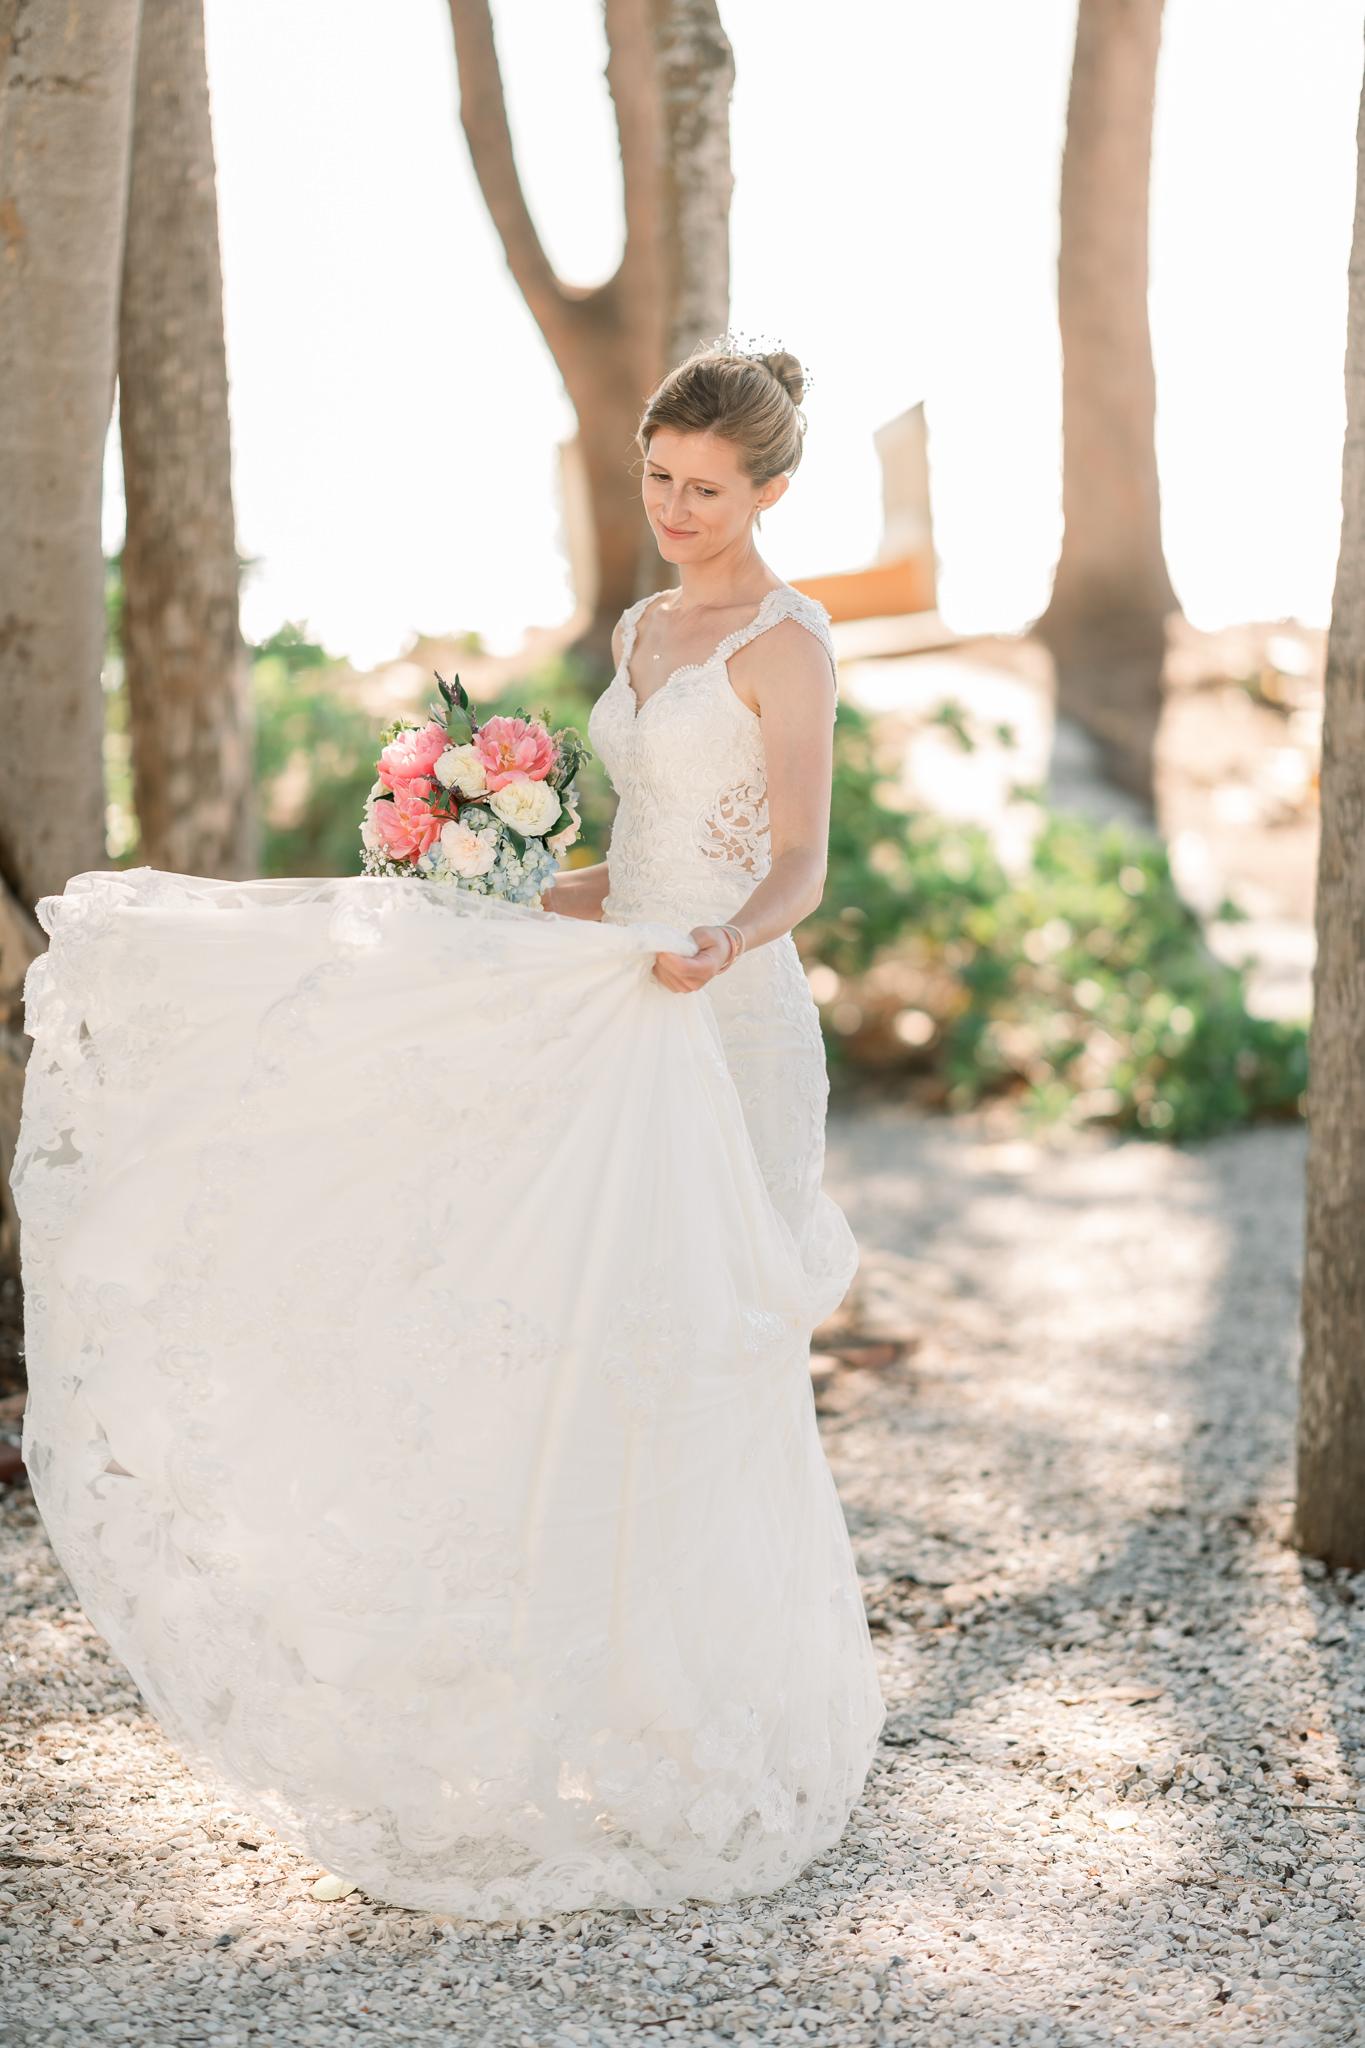 SARASOTA_WEDDING_PHOTOGRAPHY_SMMZ_7650.jpg